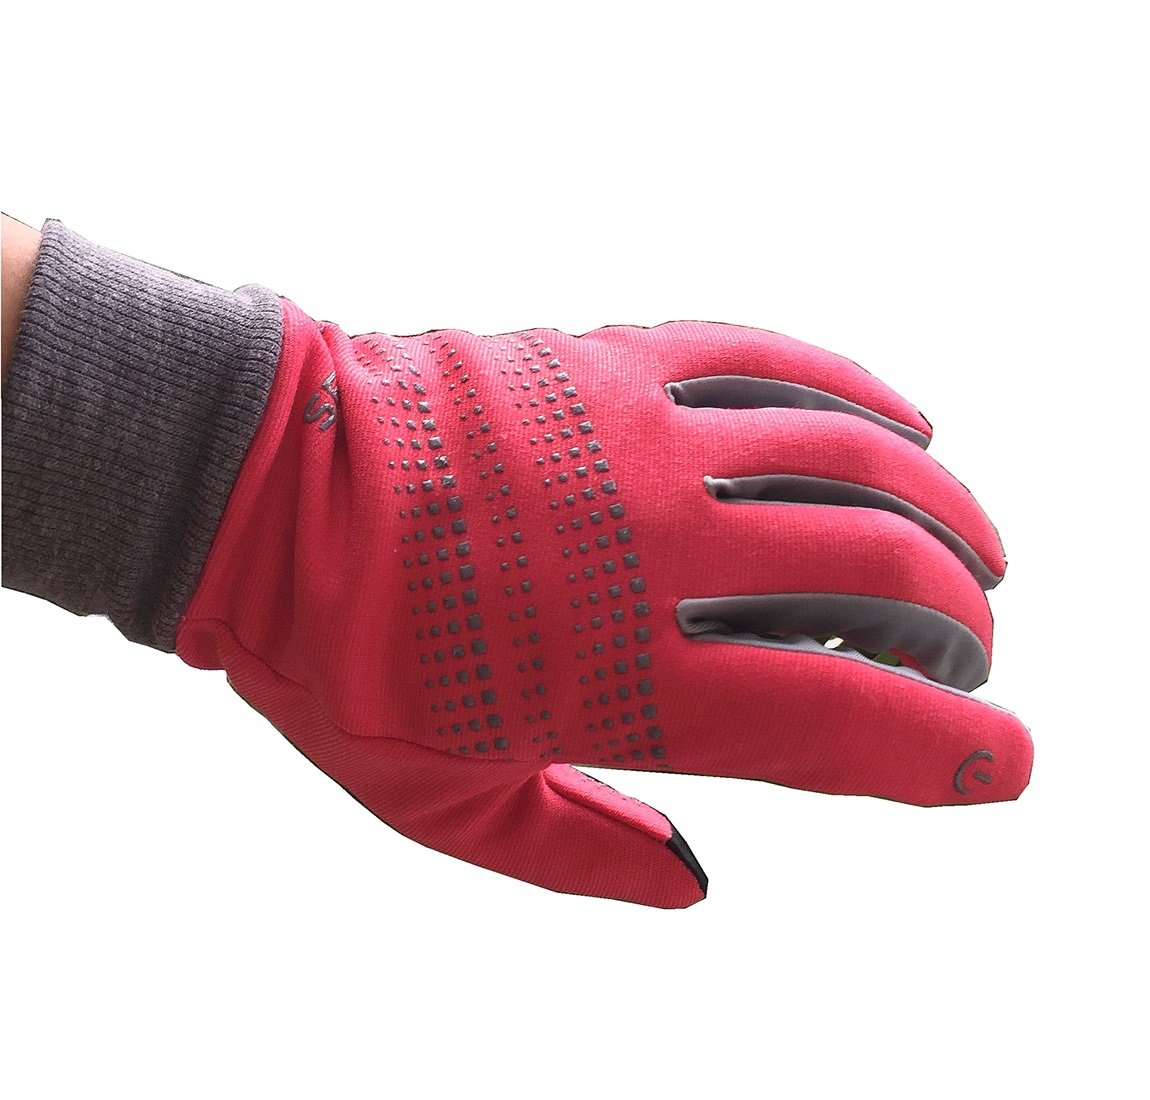 Best Rated in Women's Running Gloves & Helpful Customer